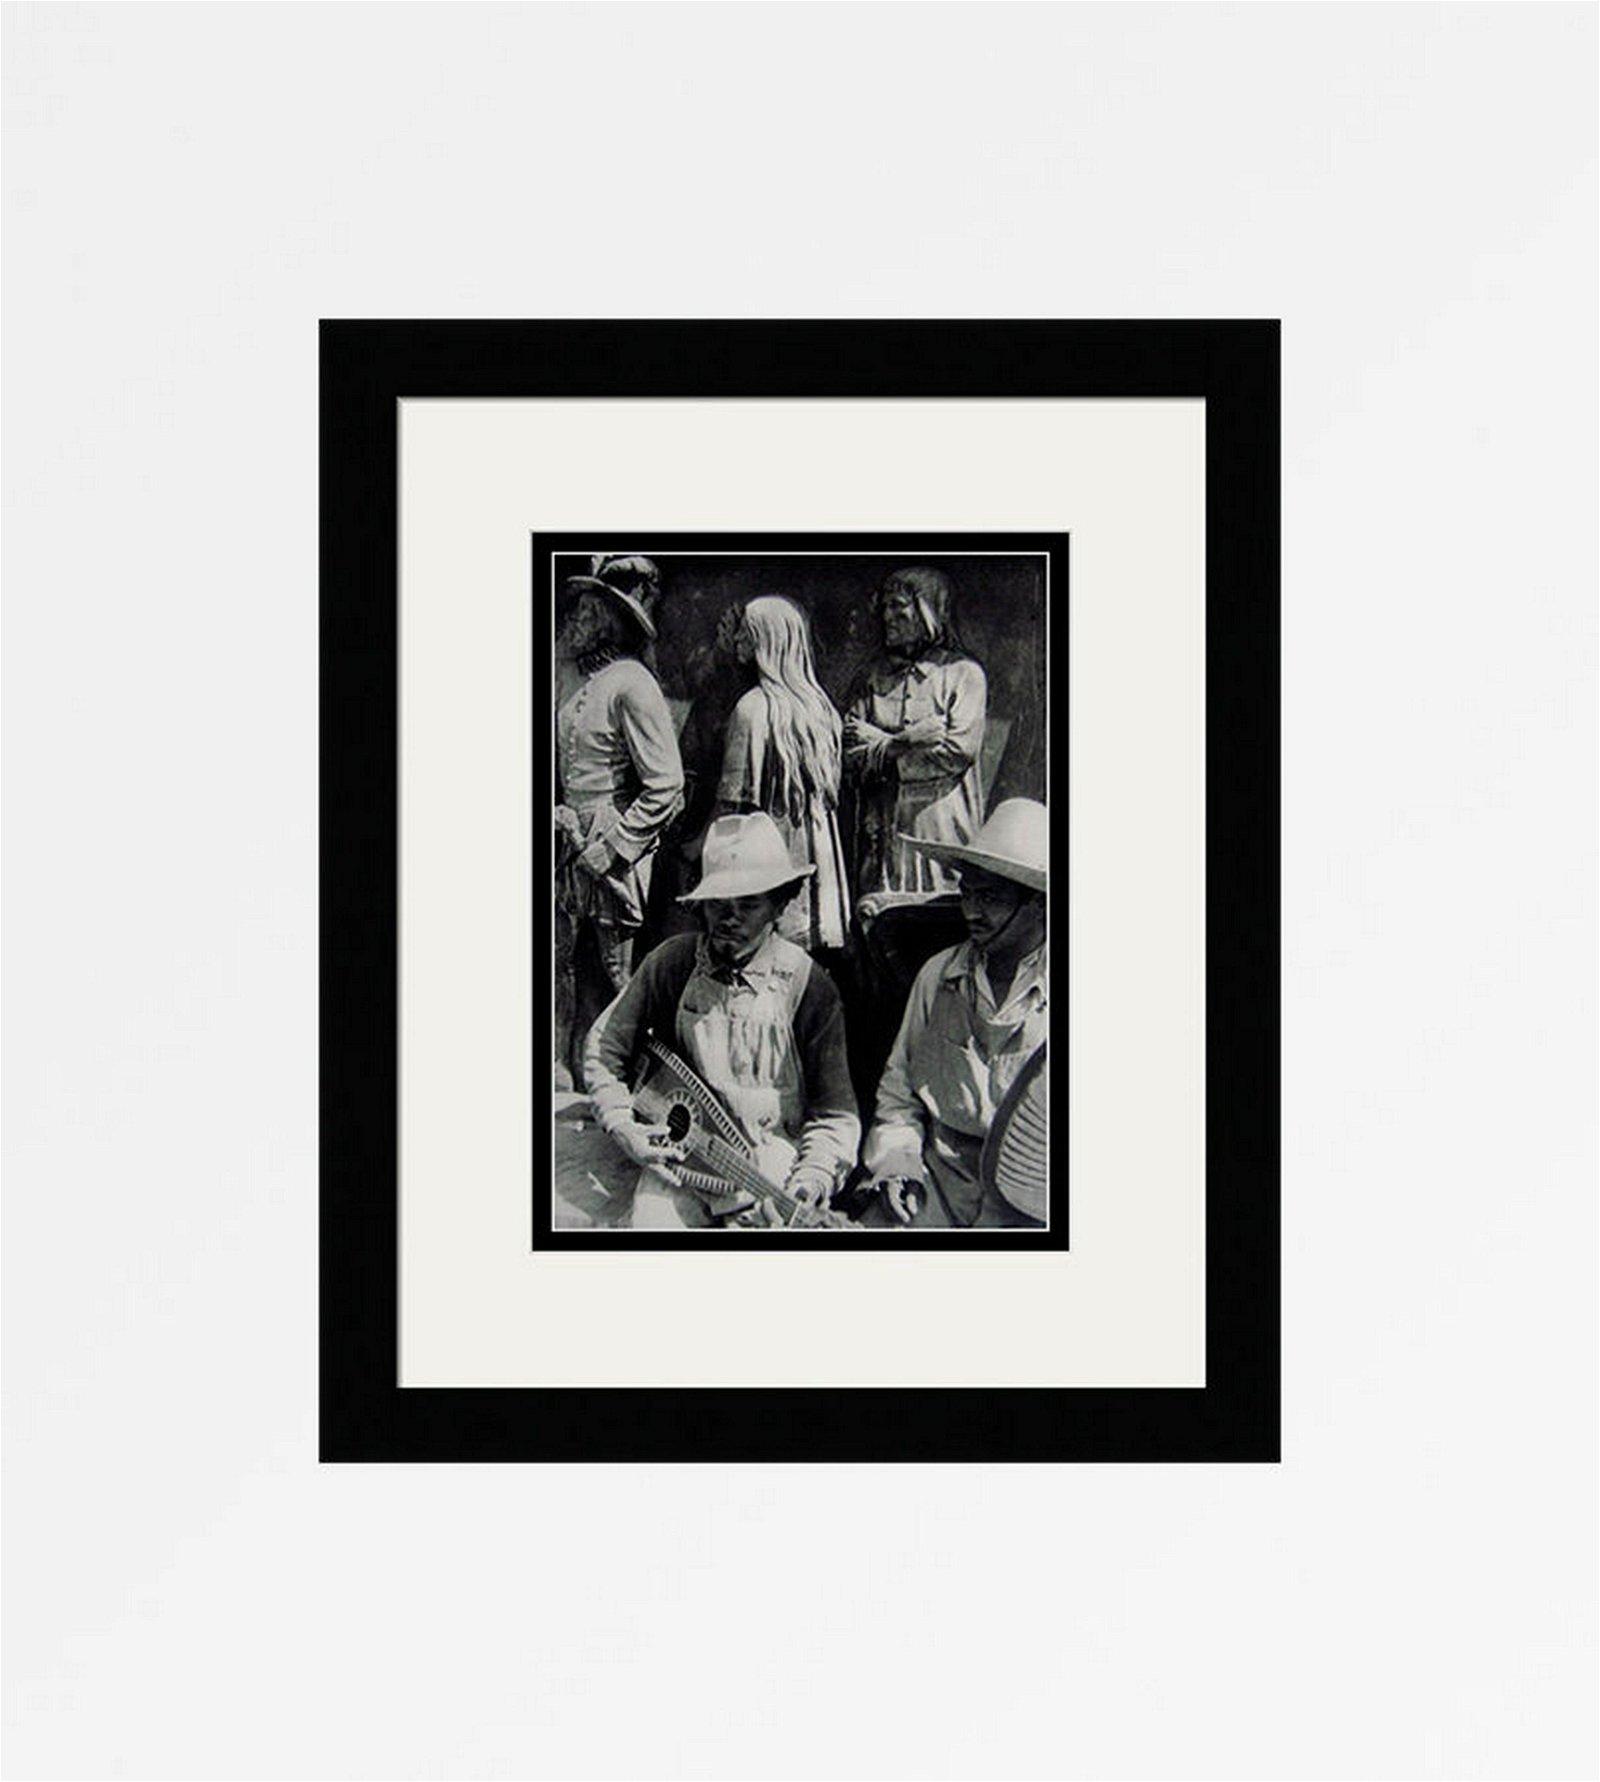 Cartier Bresson Mexico 1930's Photogravure